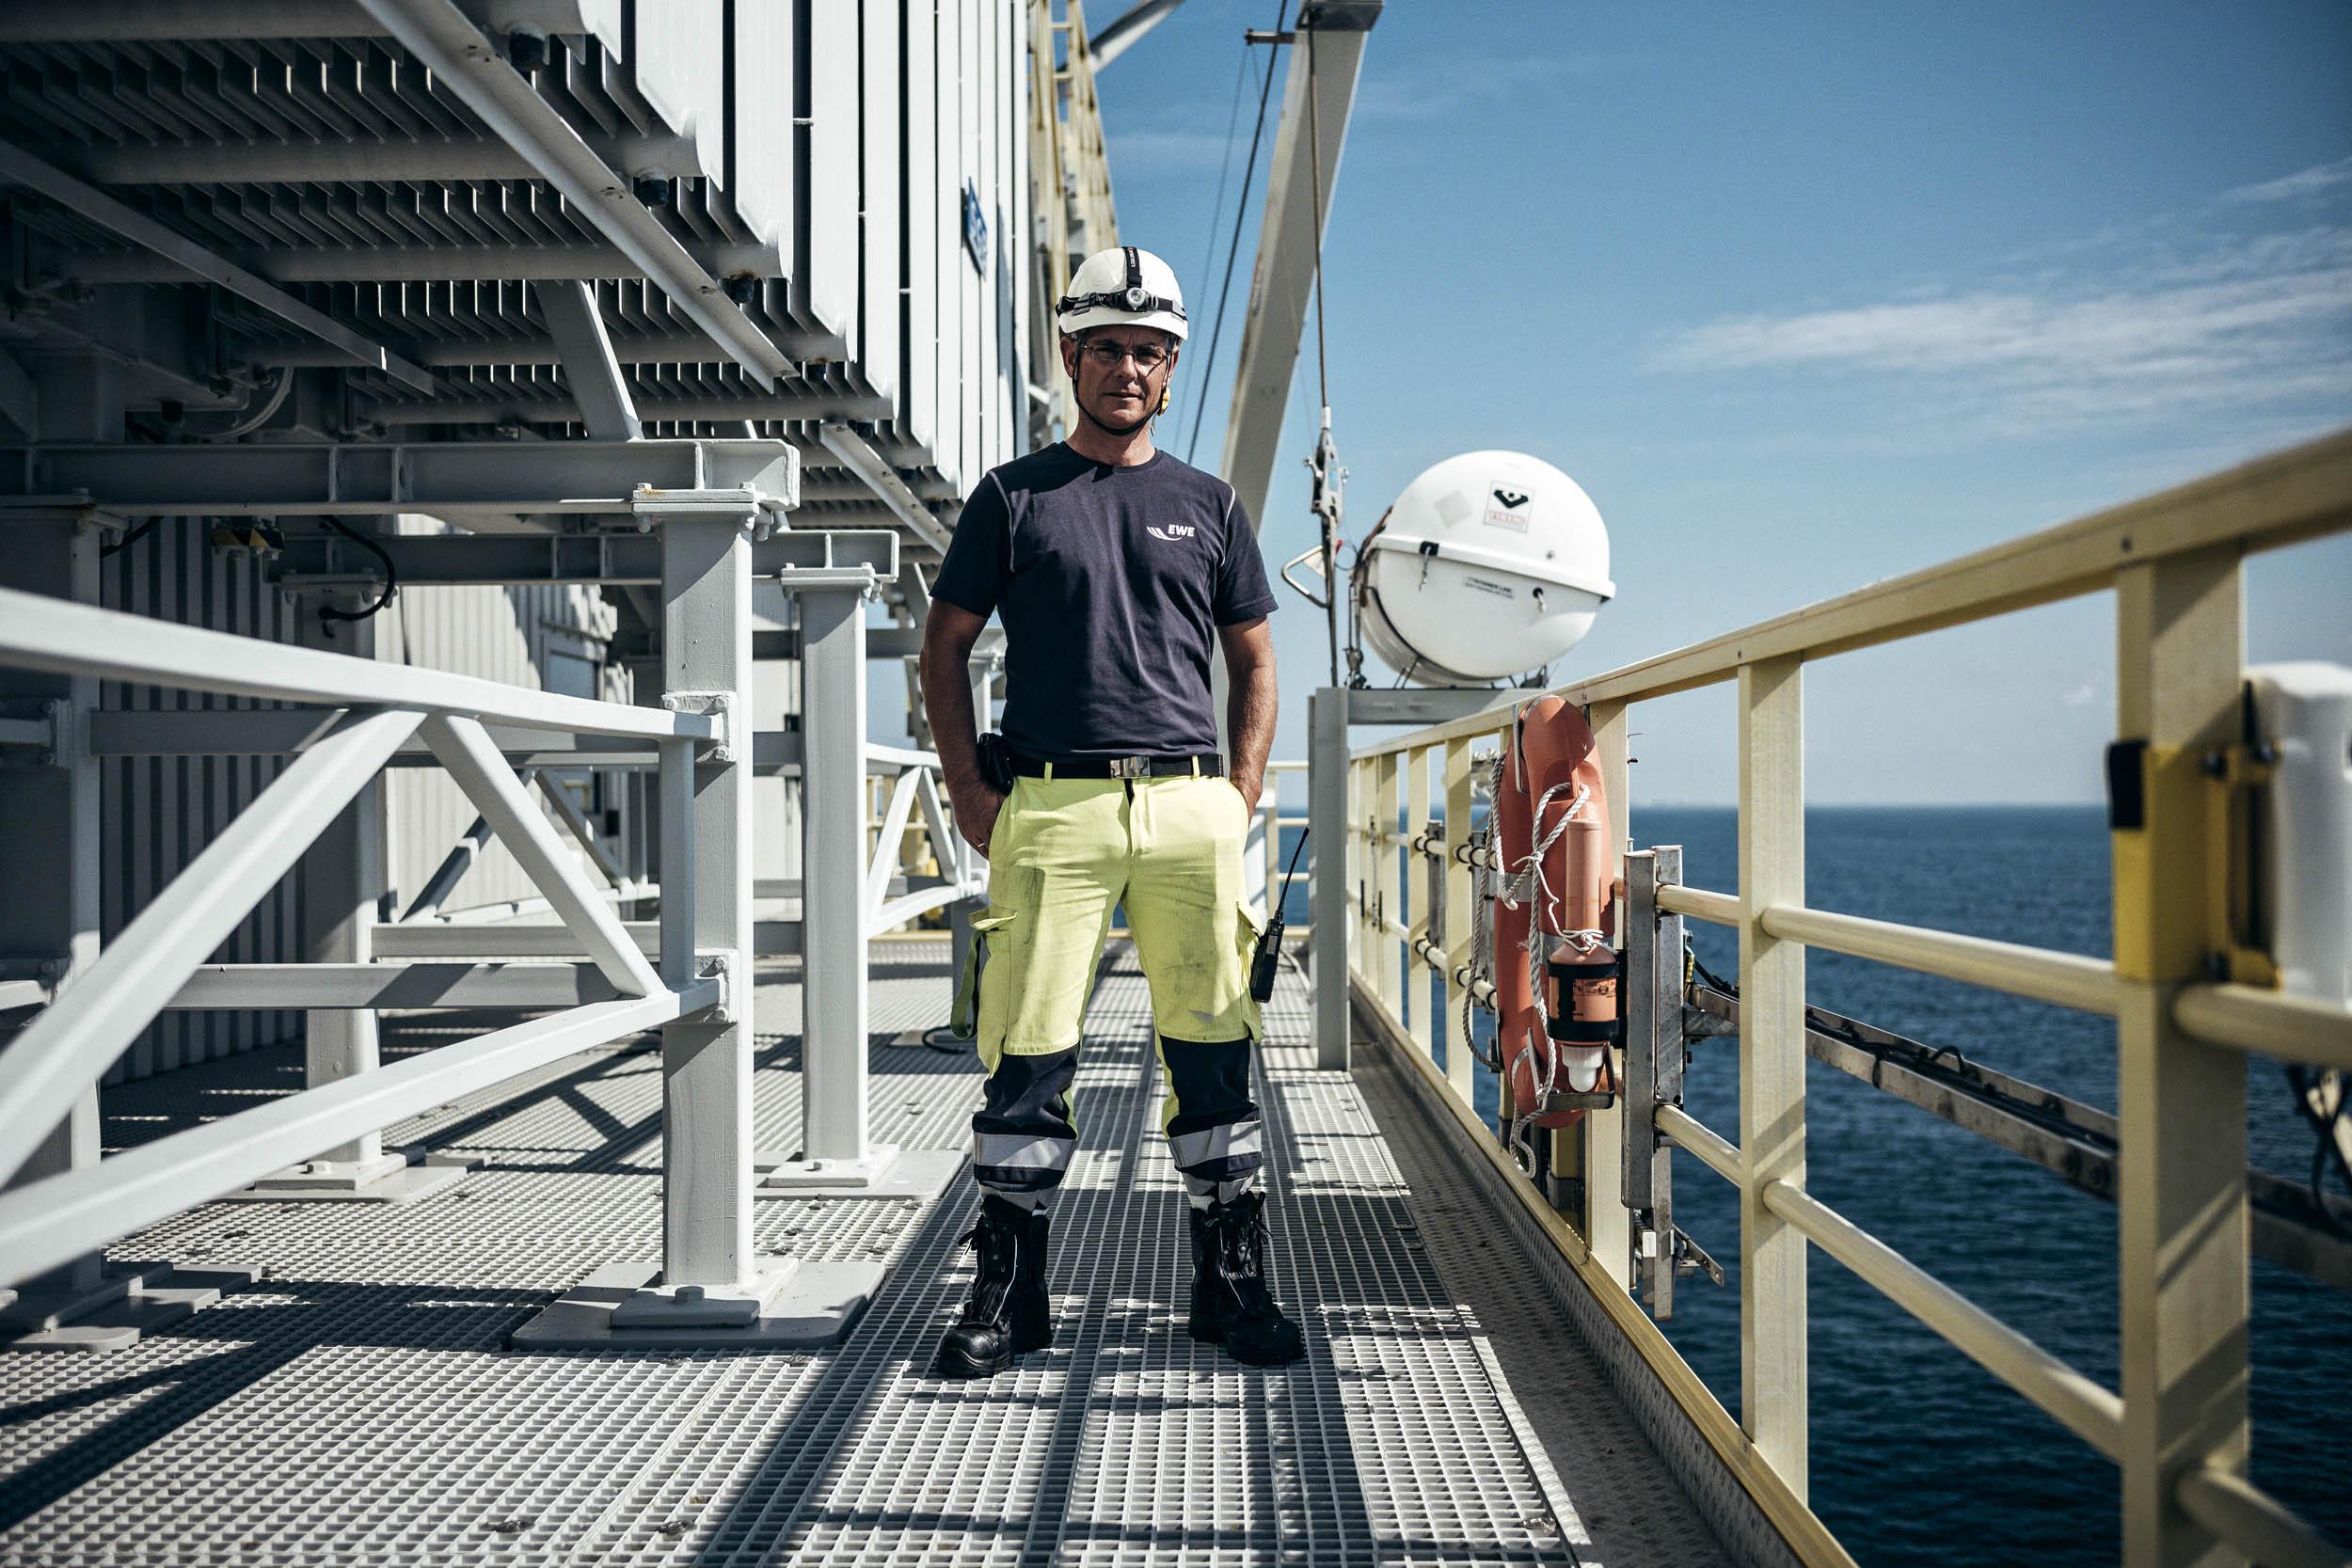 2019-SeifertUebler-EWE-offshore-windpower-029.jpg